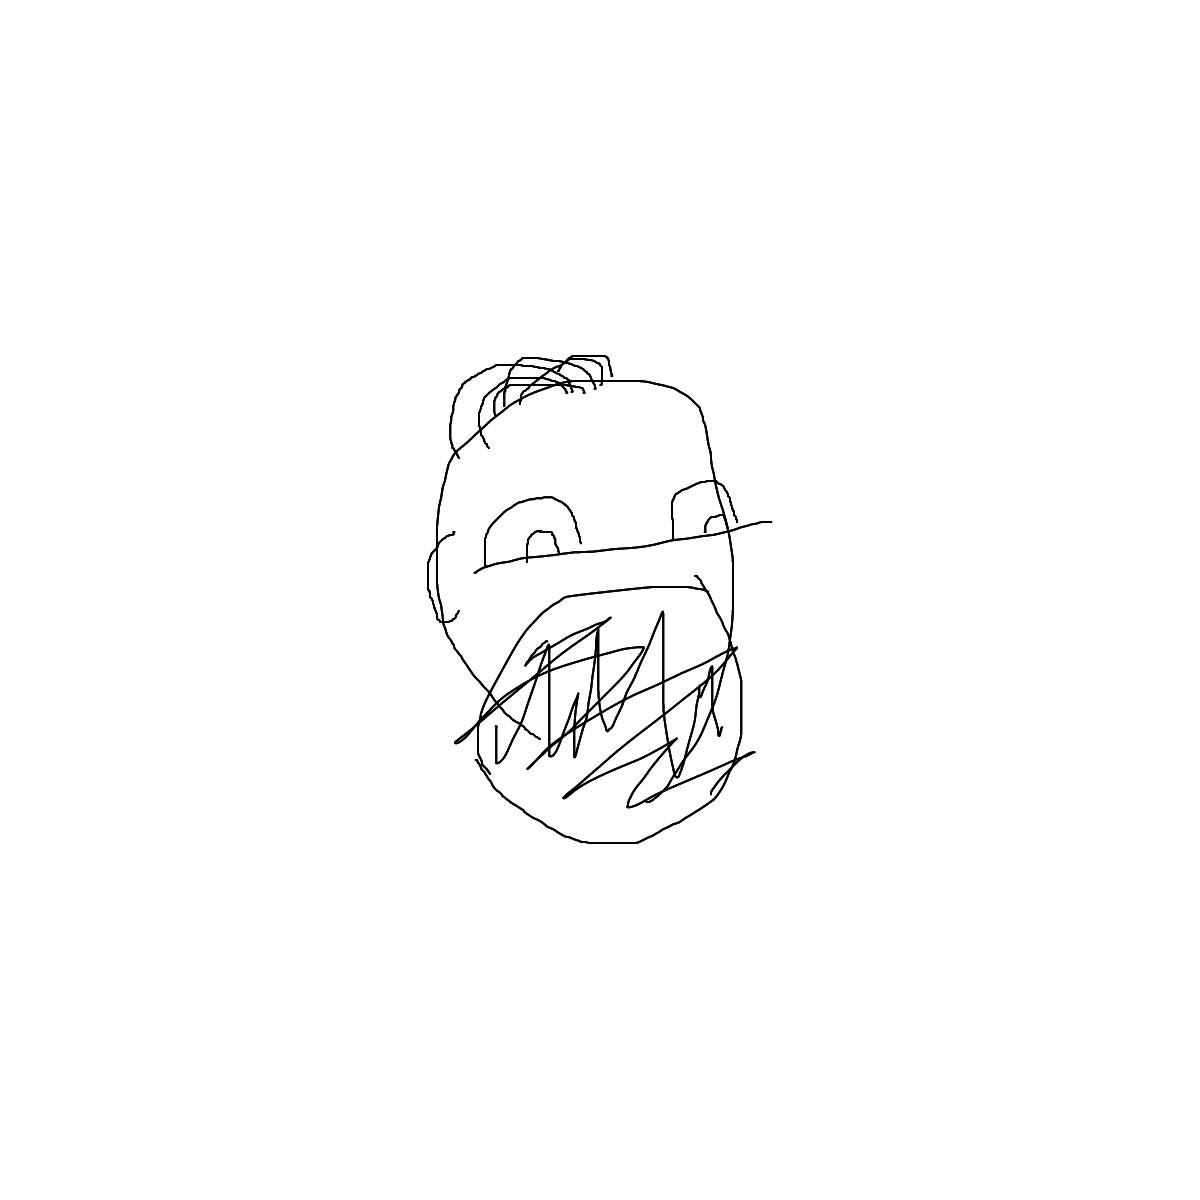 BAAAM drawing#7379 lat:41.2146263122558600lng: -73.0641479492187500